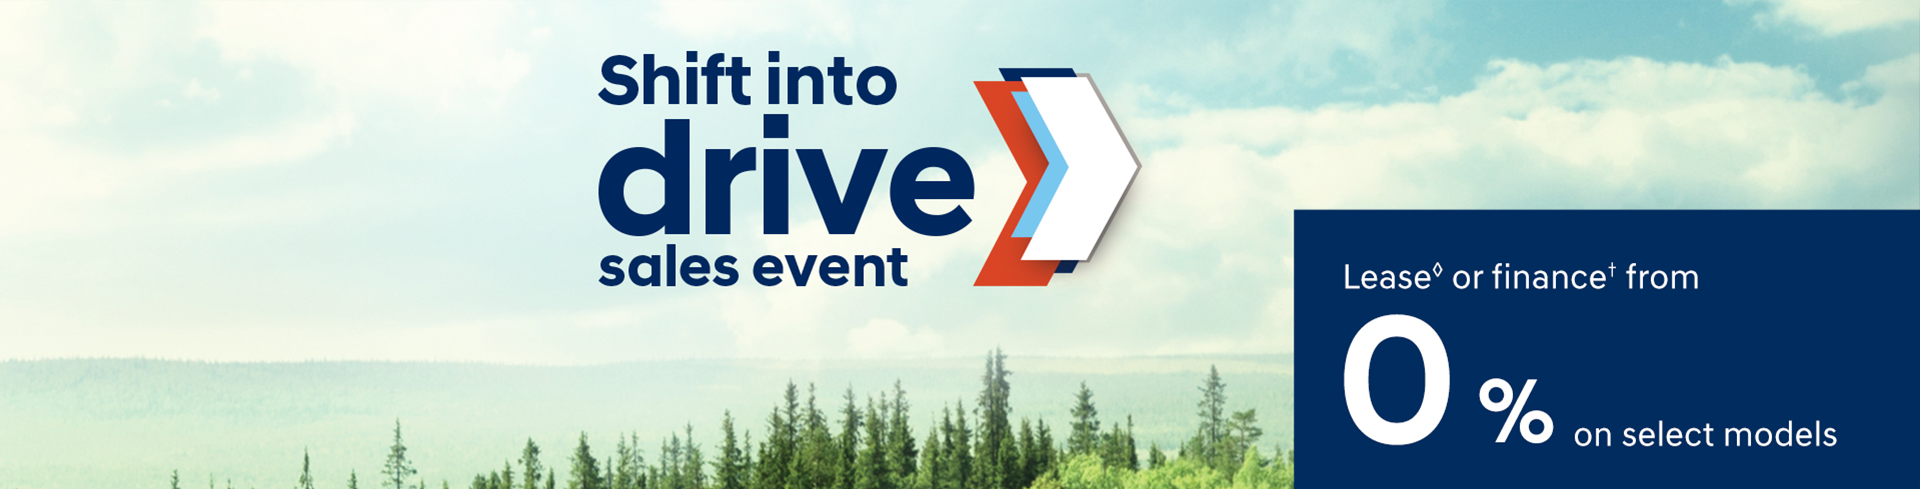 Shift-into-drive-sales-event